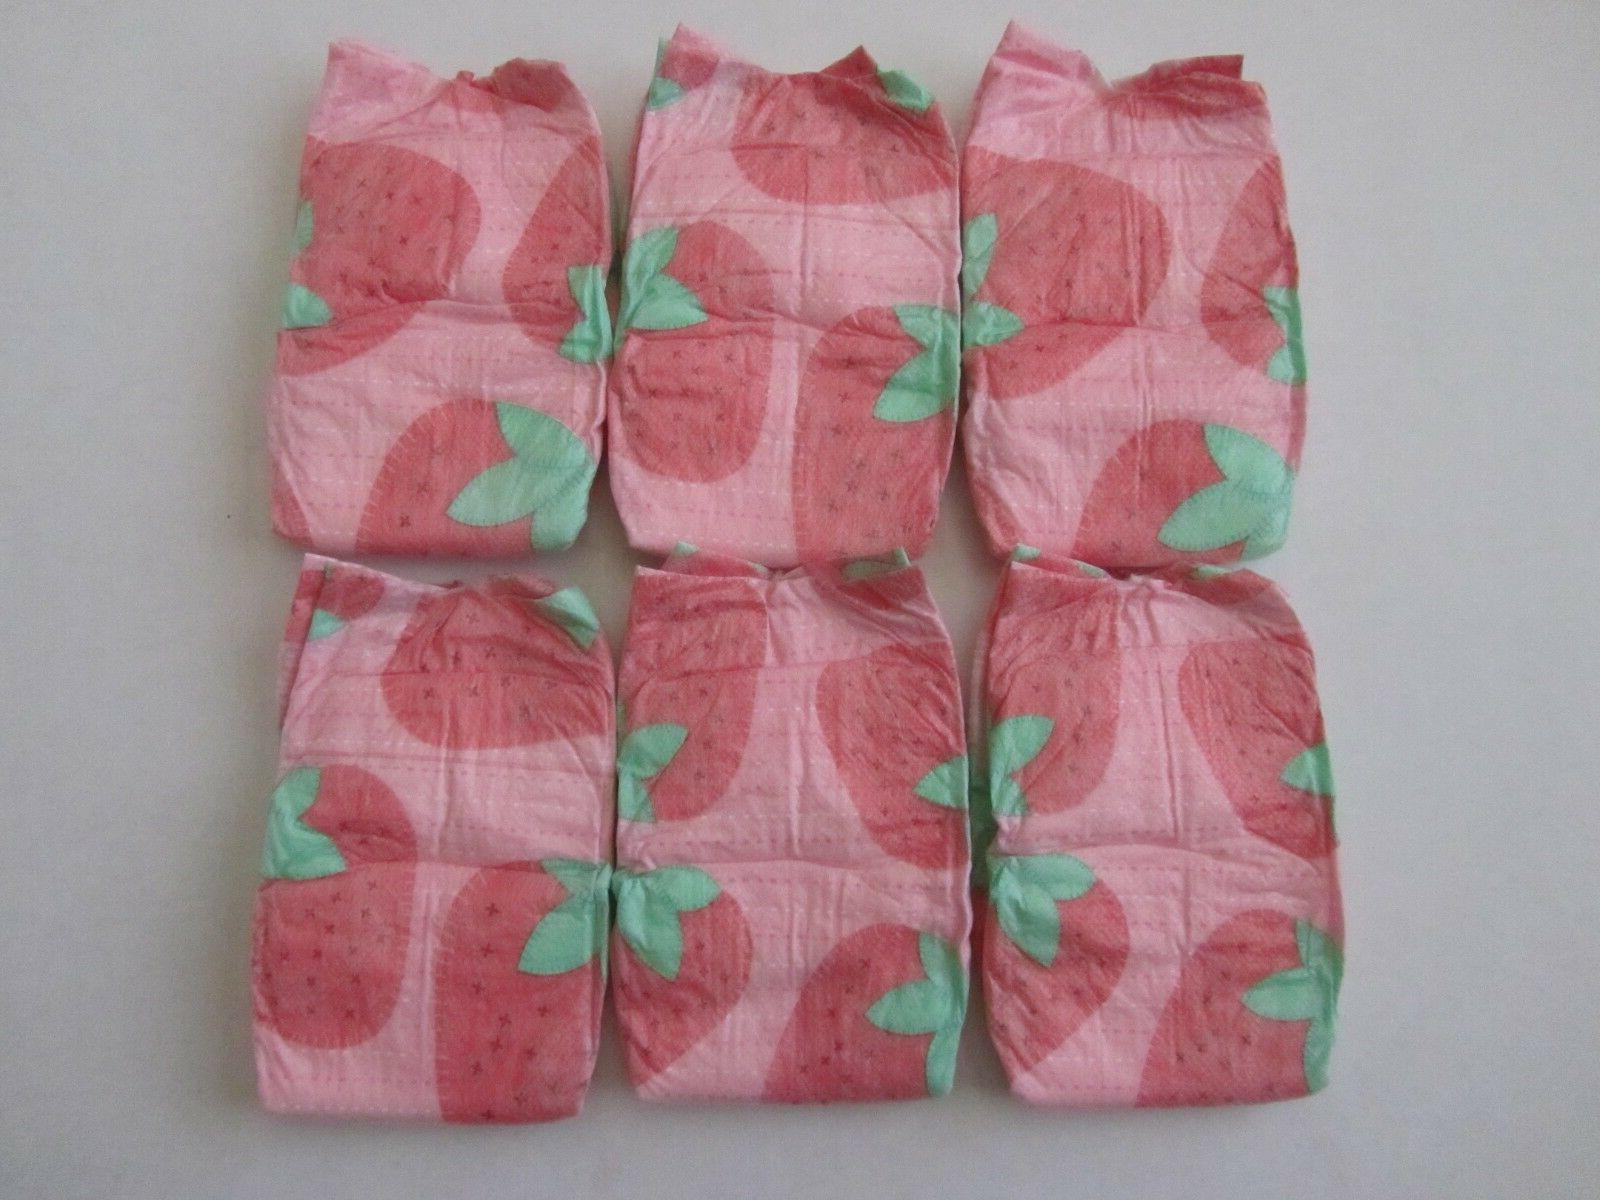 6 Baby Reborn Strawberry Print